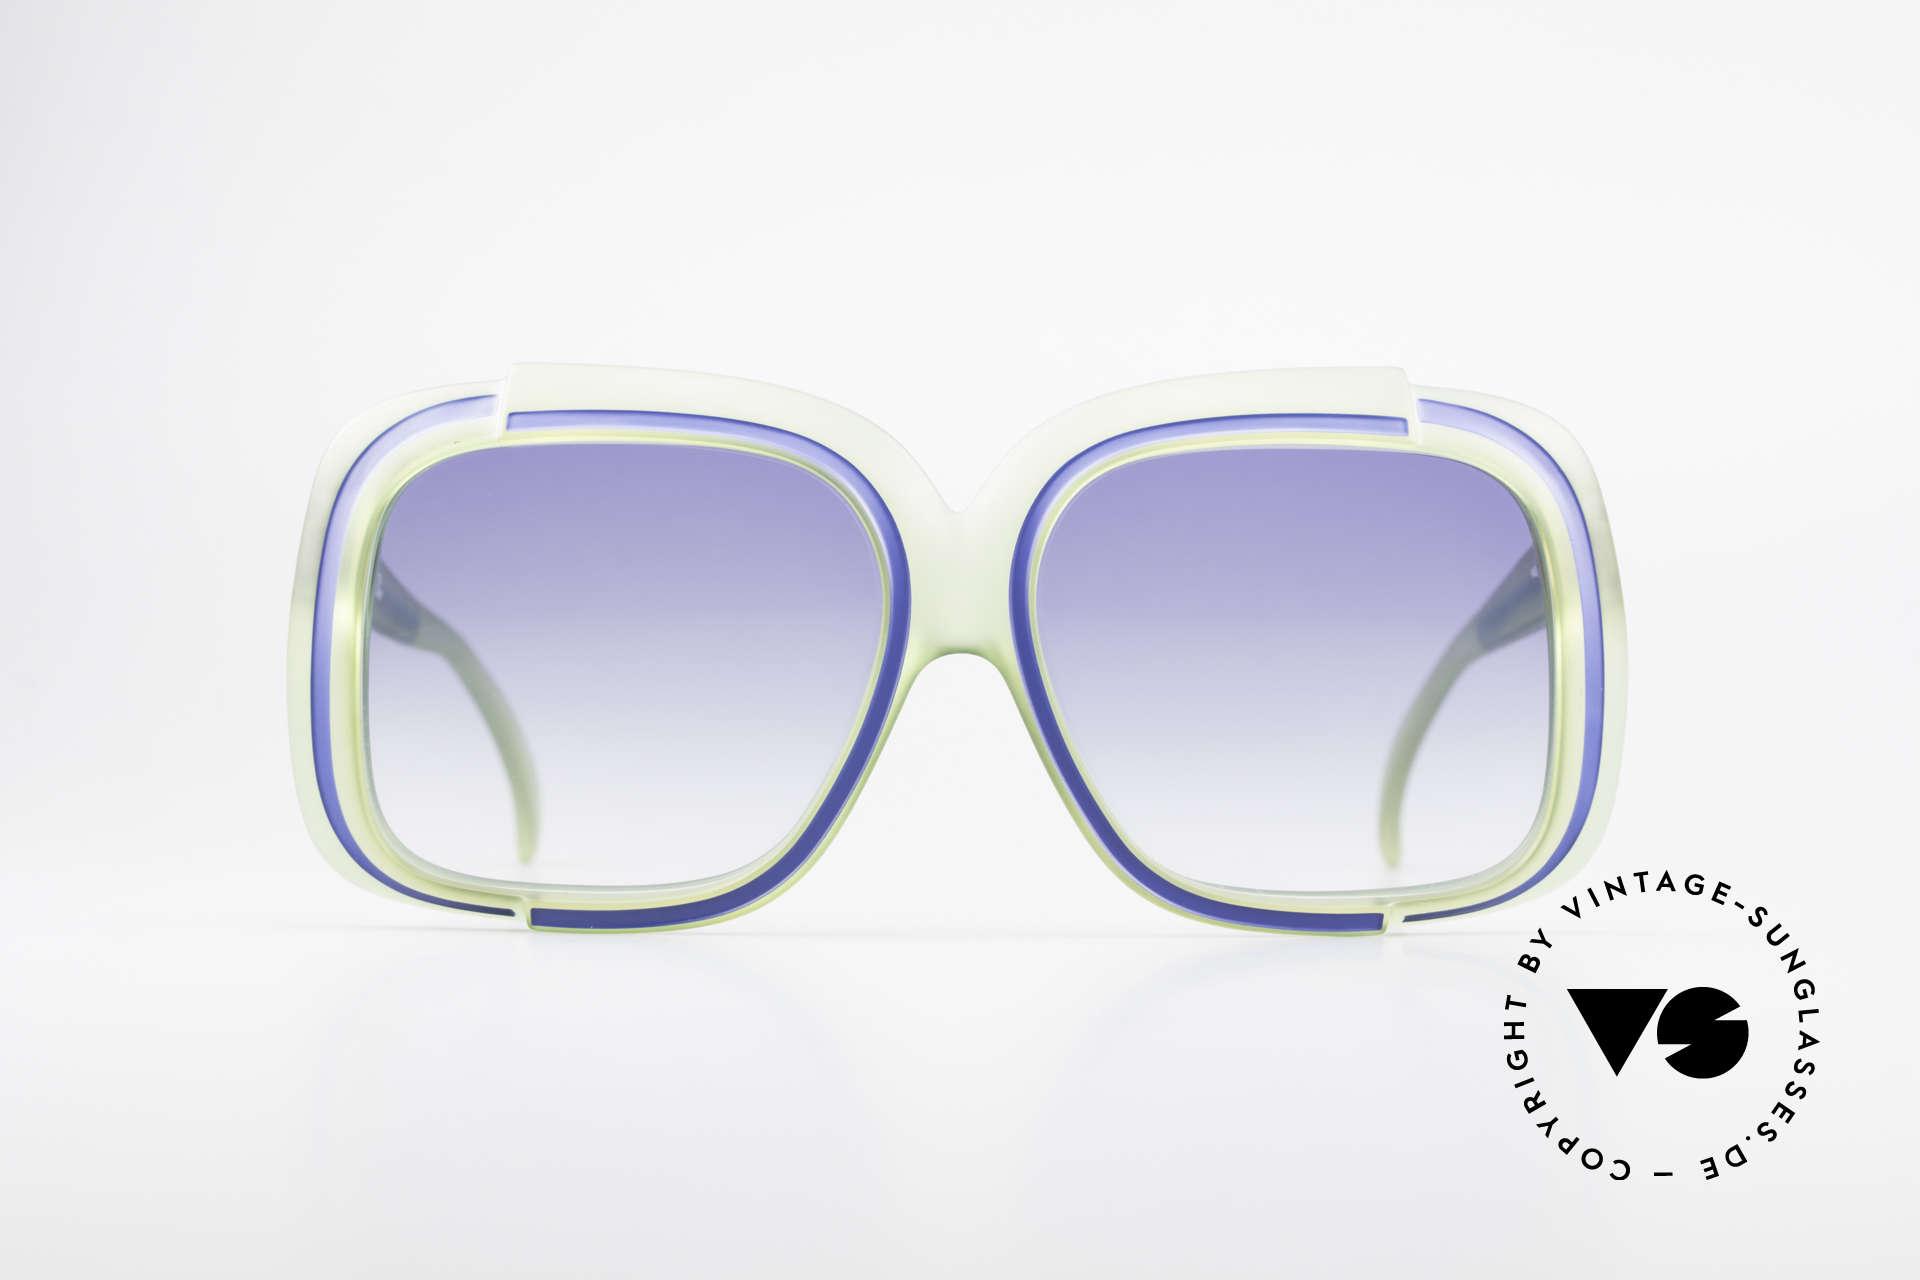 Christian Dior 2042 Rare Vintage Sunglasses 70's, one of the first sunglass' models by Christian Dior, ever, Made for Women